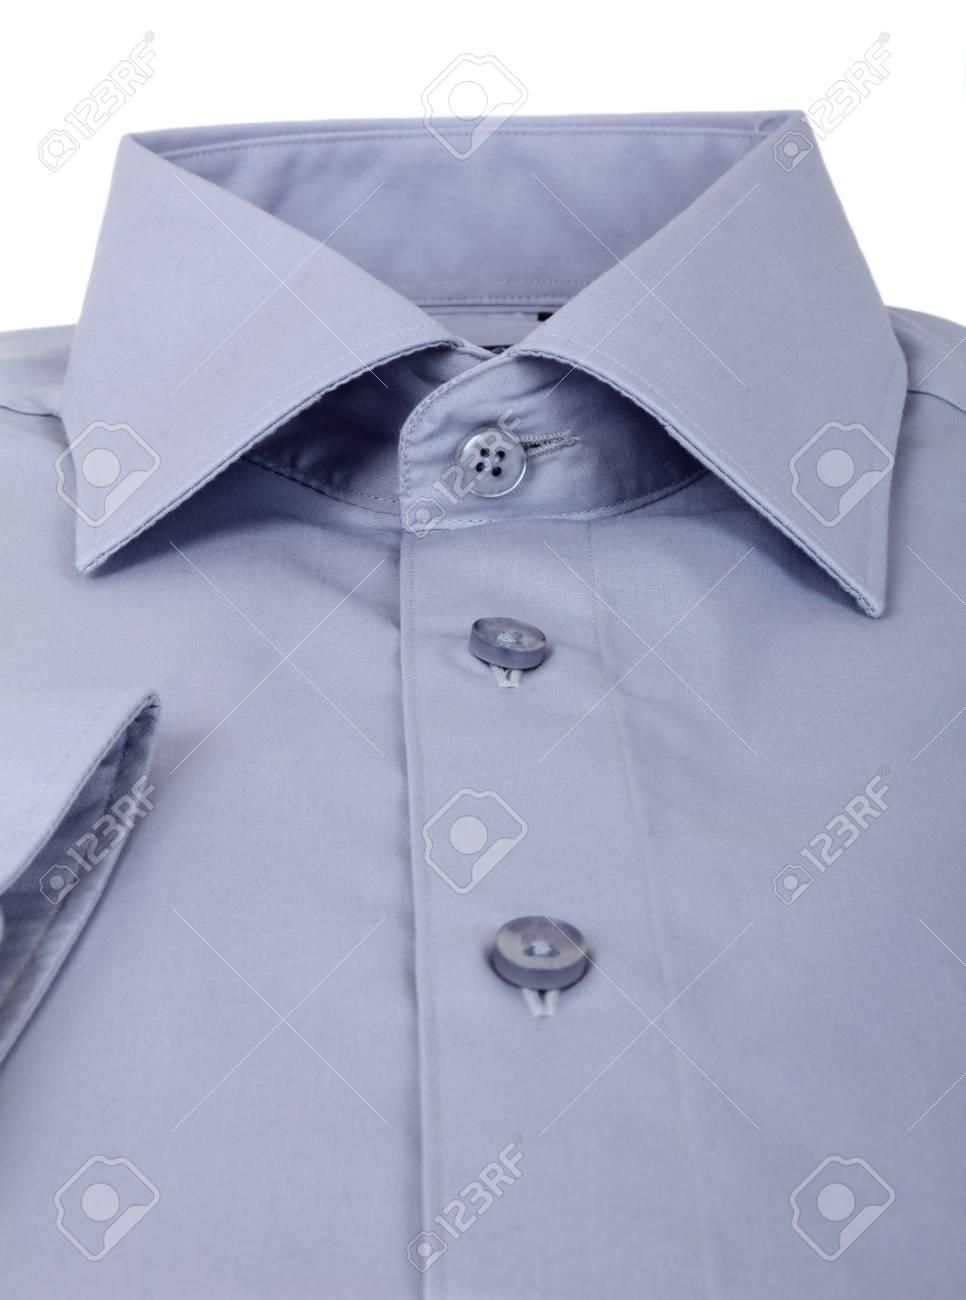 A new grey man Stock Photo - 16398377